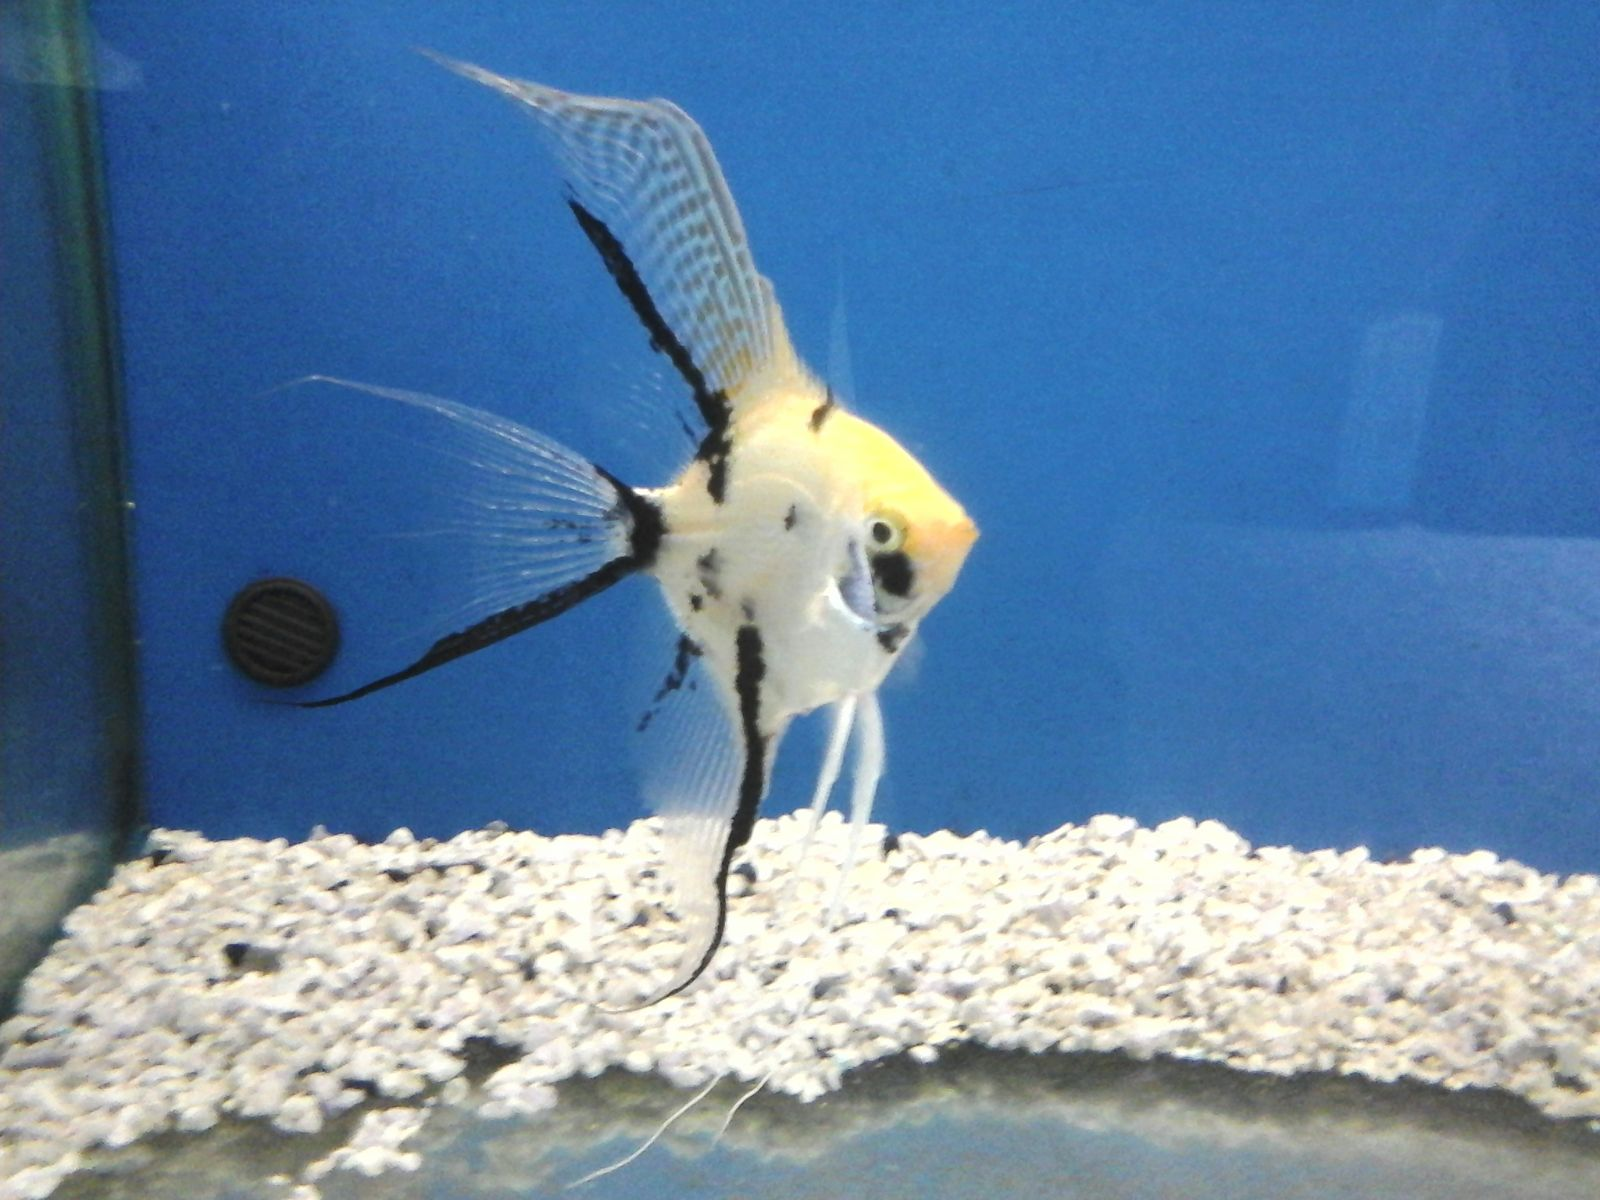 Pirana aquarium pesci tropicali d 39 acqua dolce i ciclidi for Vendita pesci acqua dolce fredda